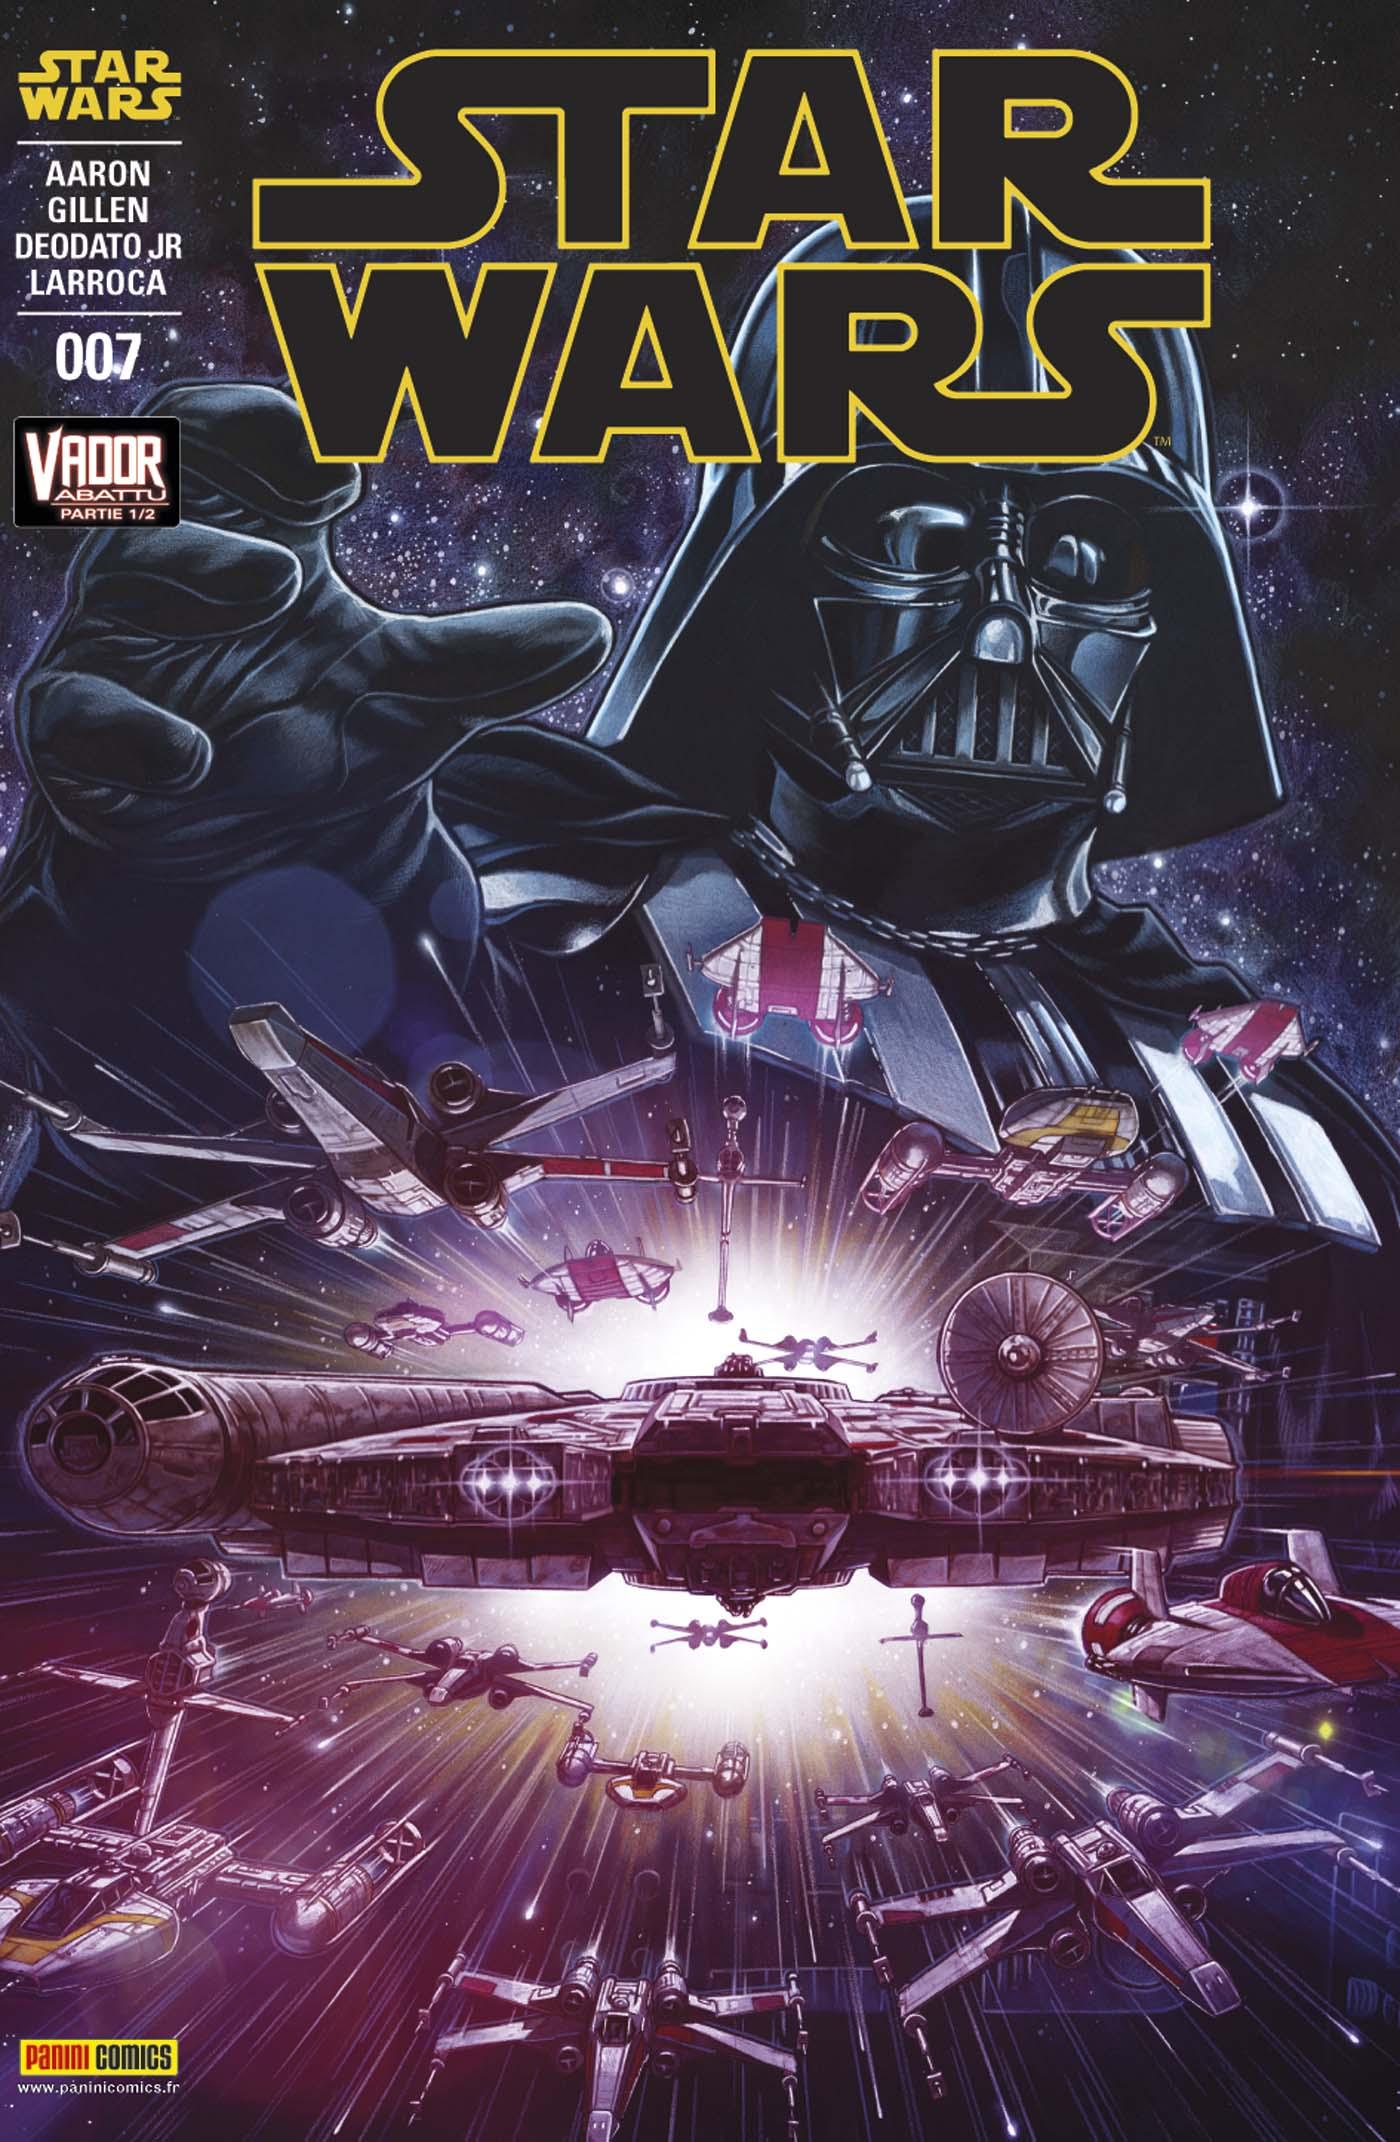 Star Wars Comics 7 - Couverture A